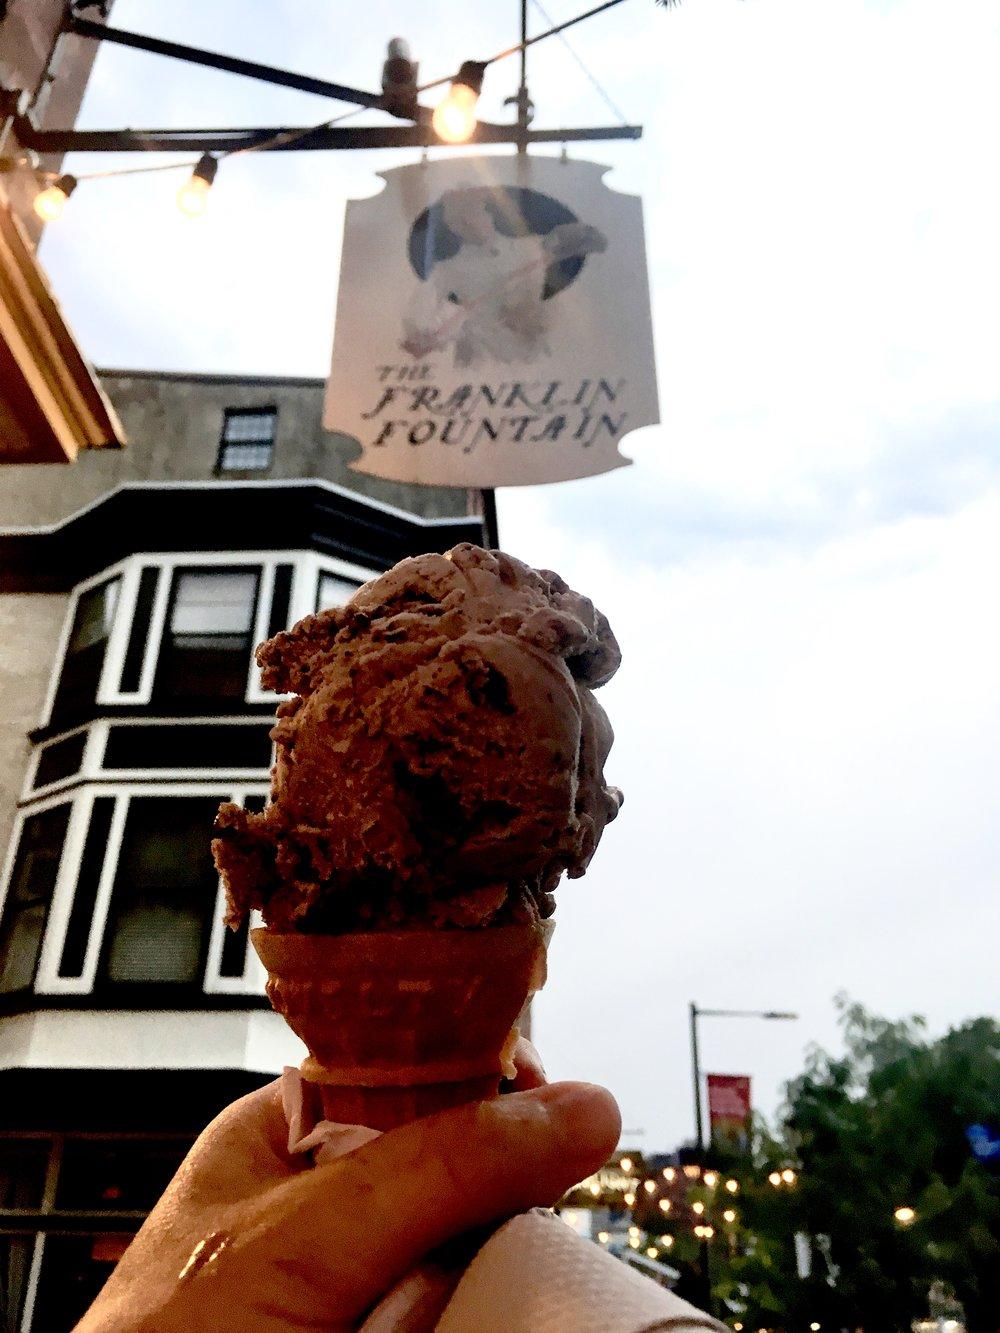 The Franklin Fountain Ice Cream Penn's Landing Philadelphia